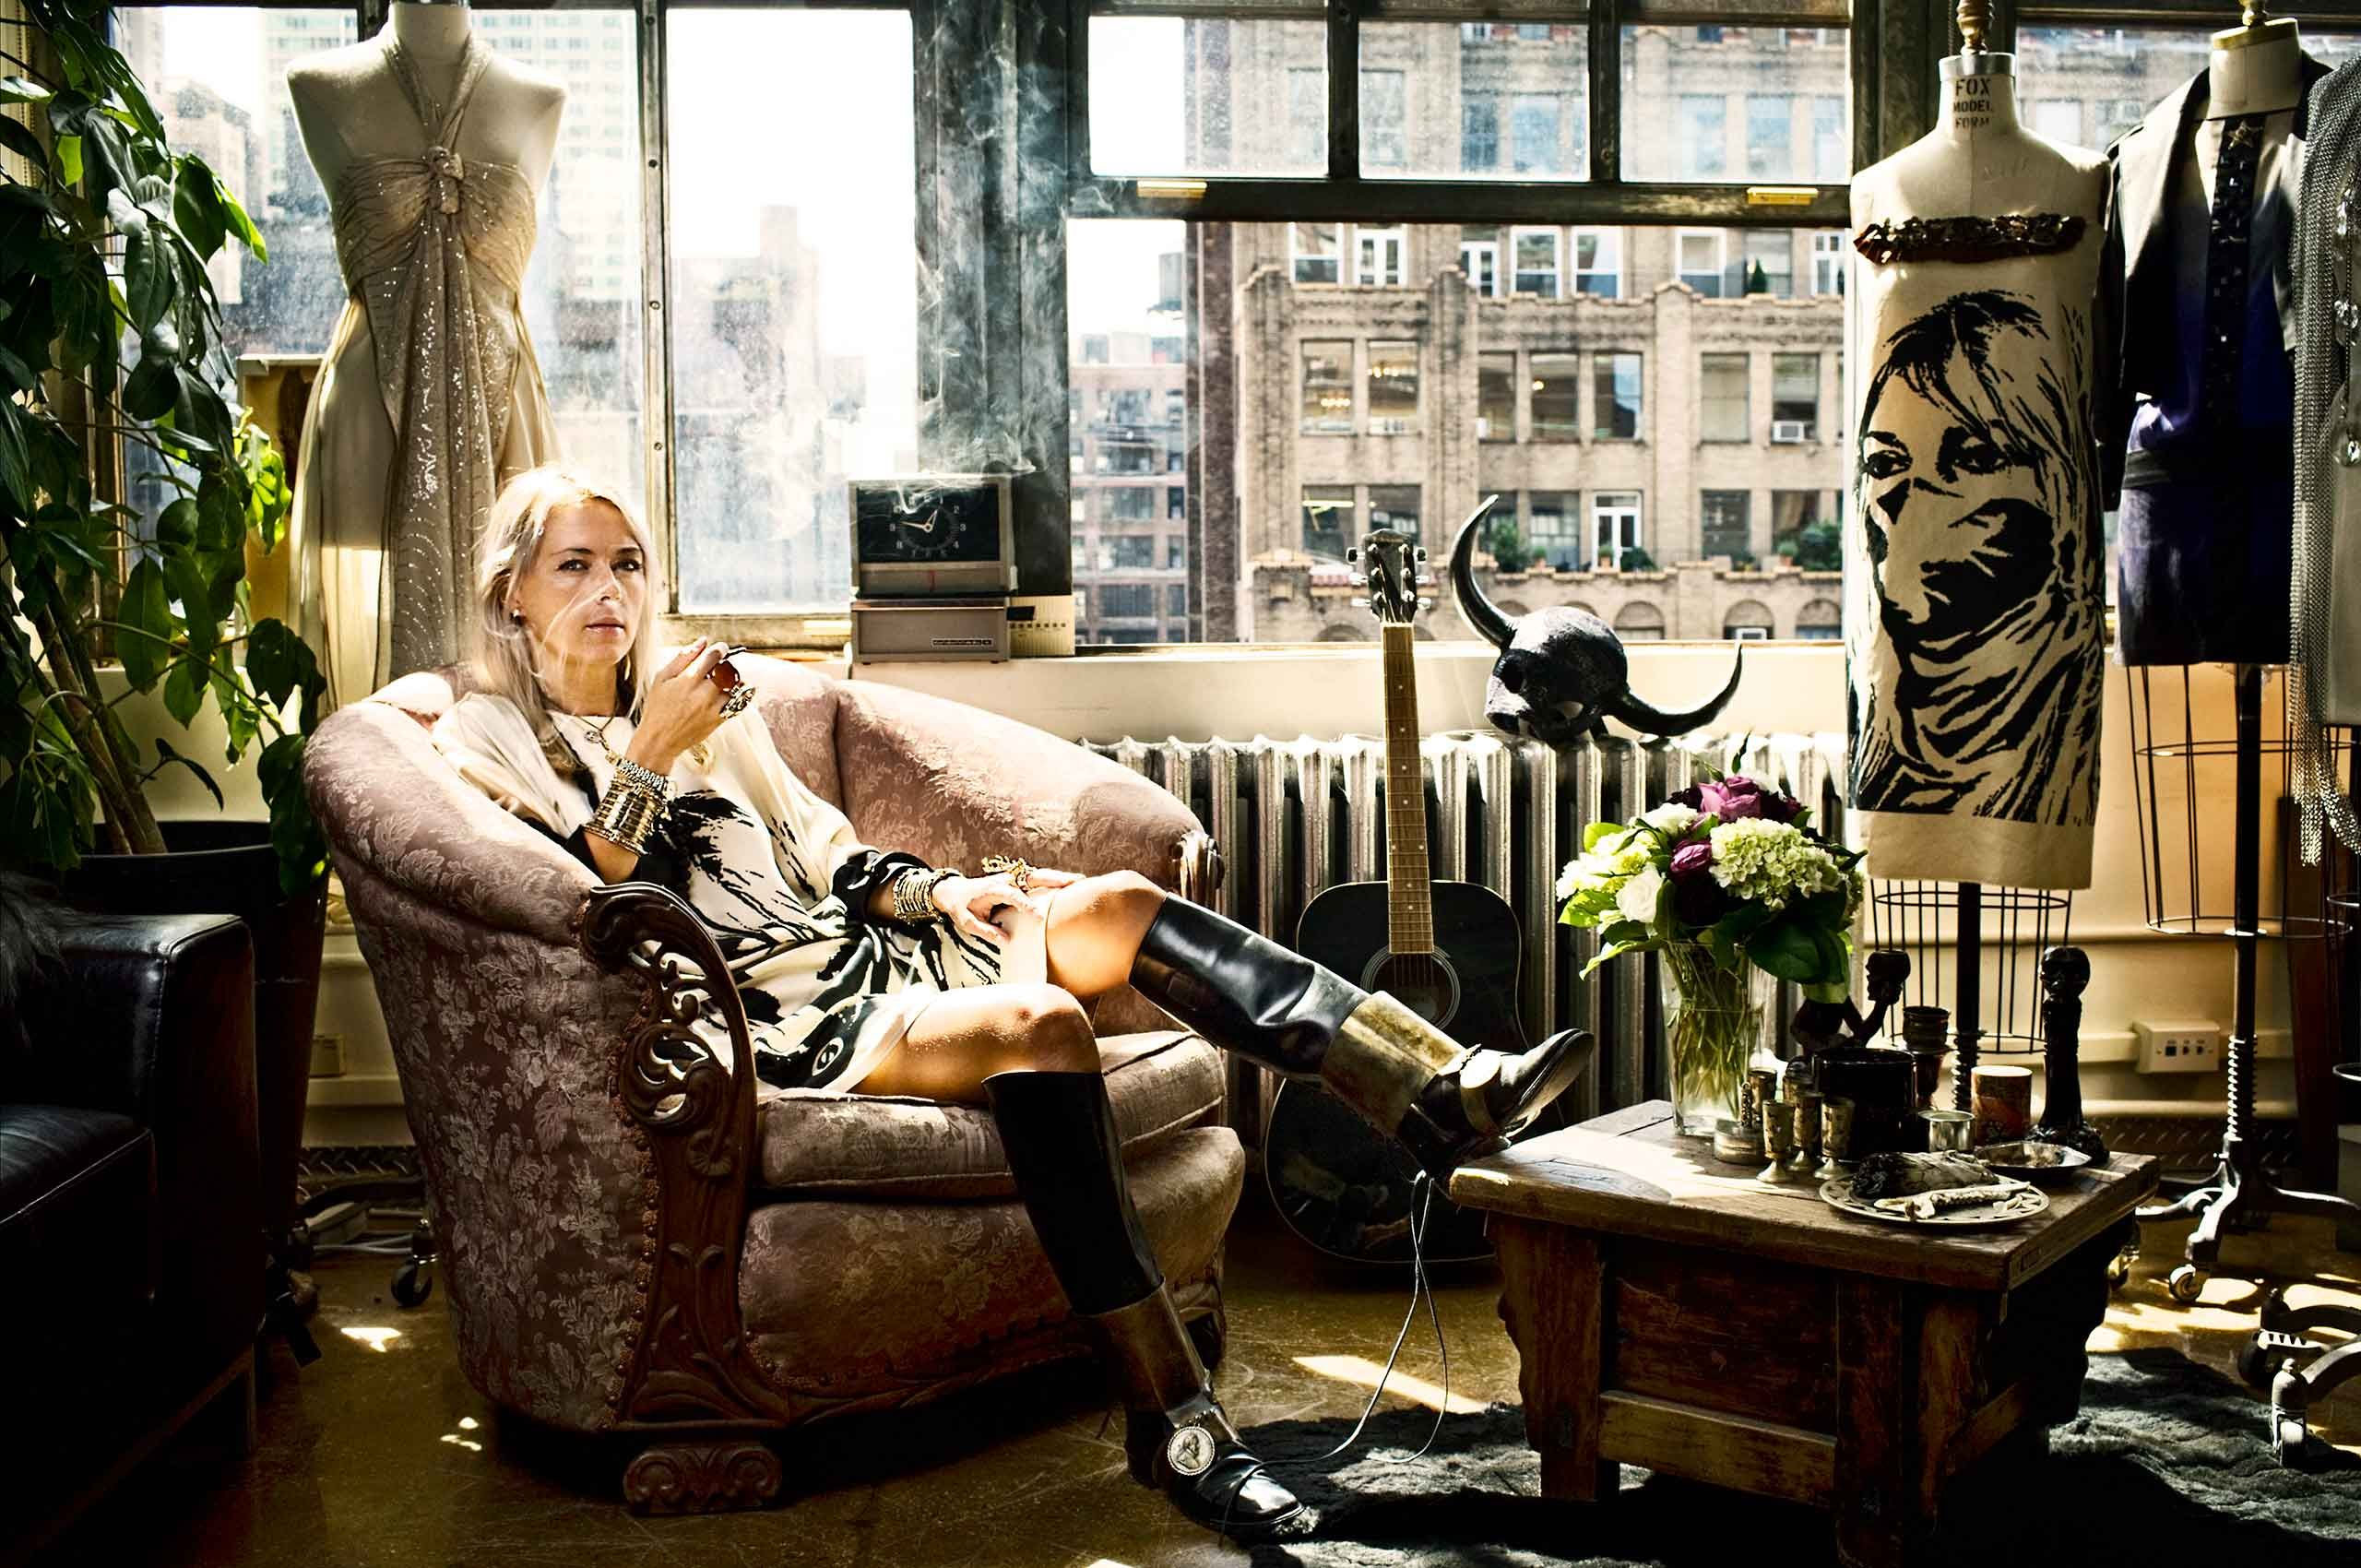 FashionDesigner-EliseOverland-in-her-studio-by-HenrikOlundPhotography.jpg